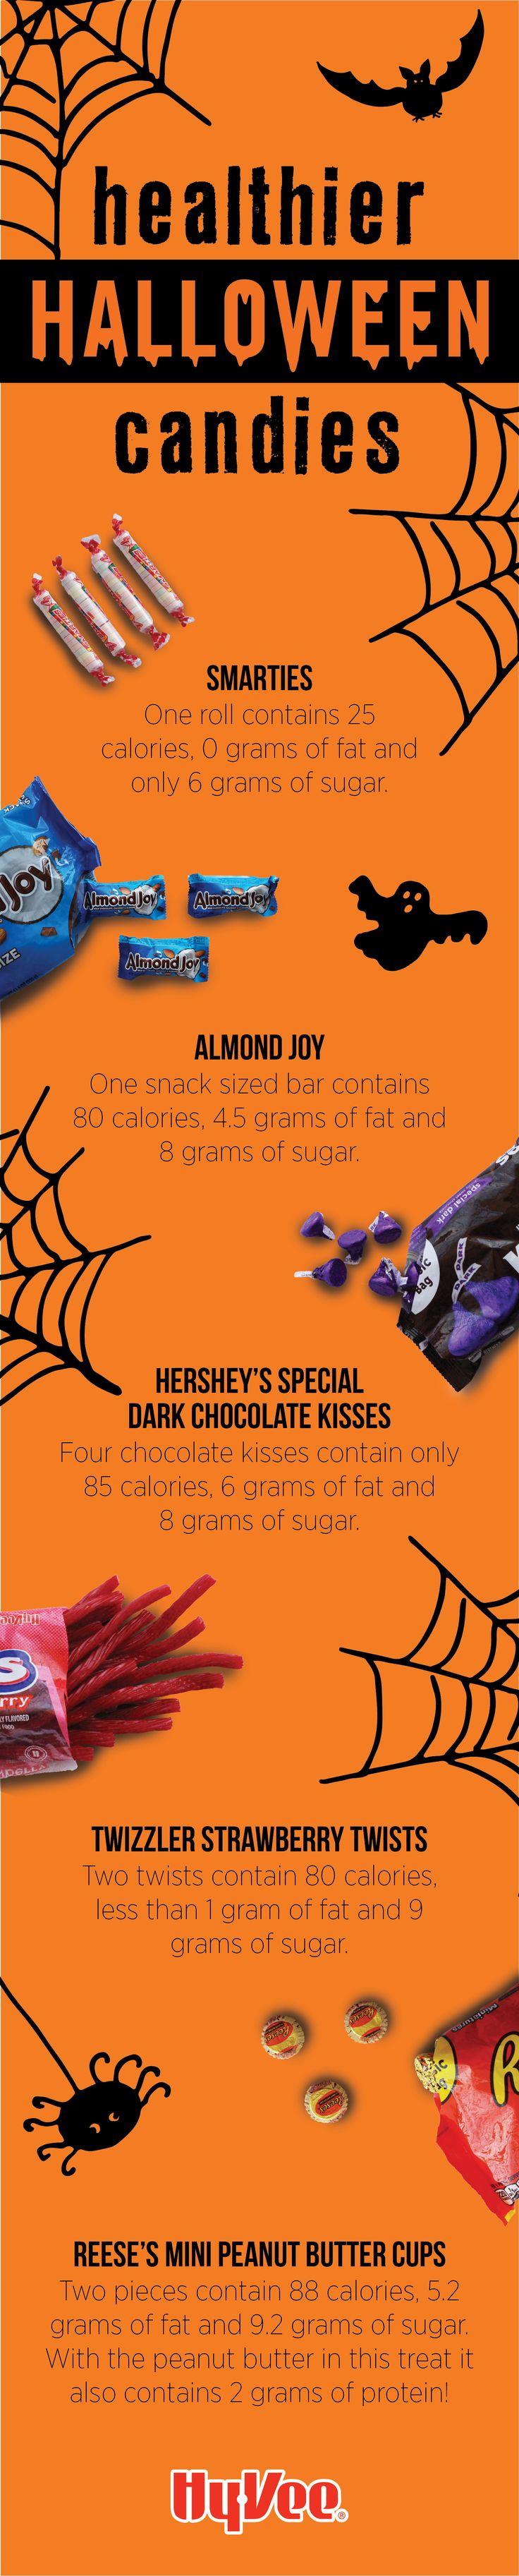 best halloween decorations images on pinterest halloween ideas